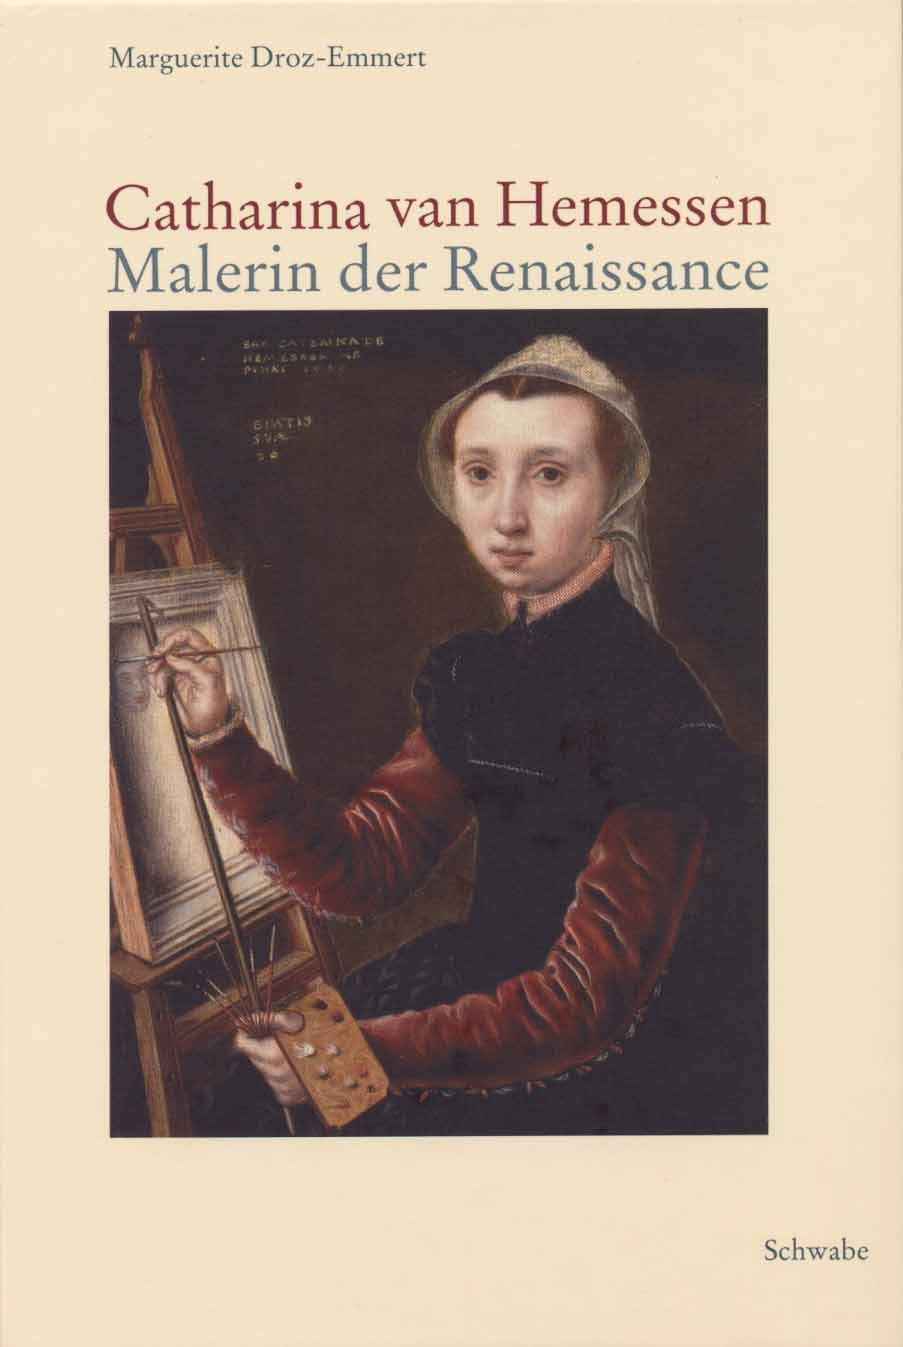 Catharina van Hemessen, self-portrait